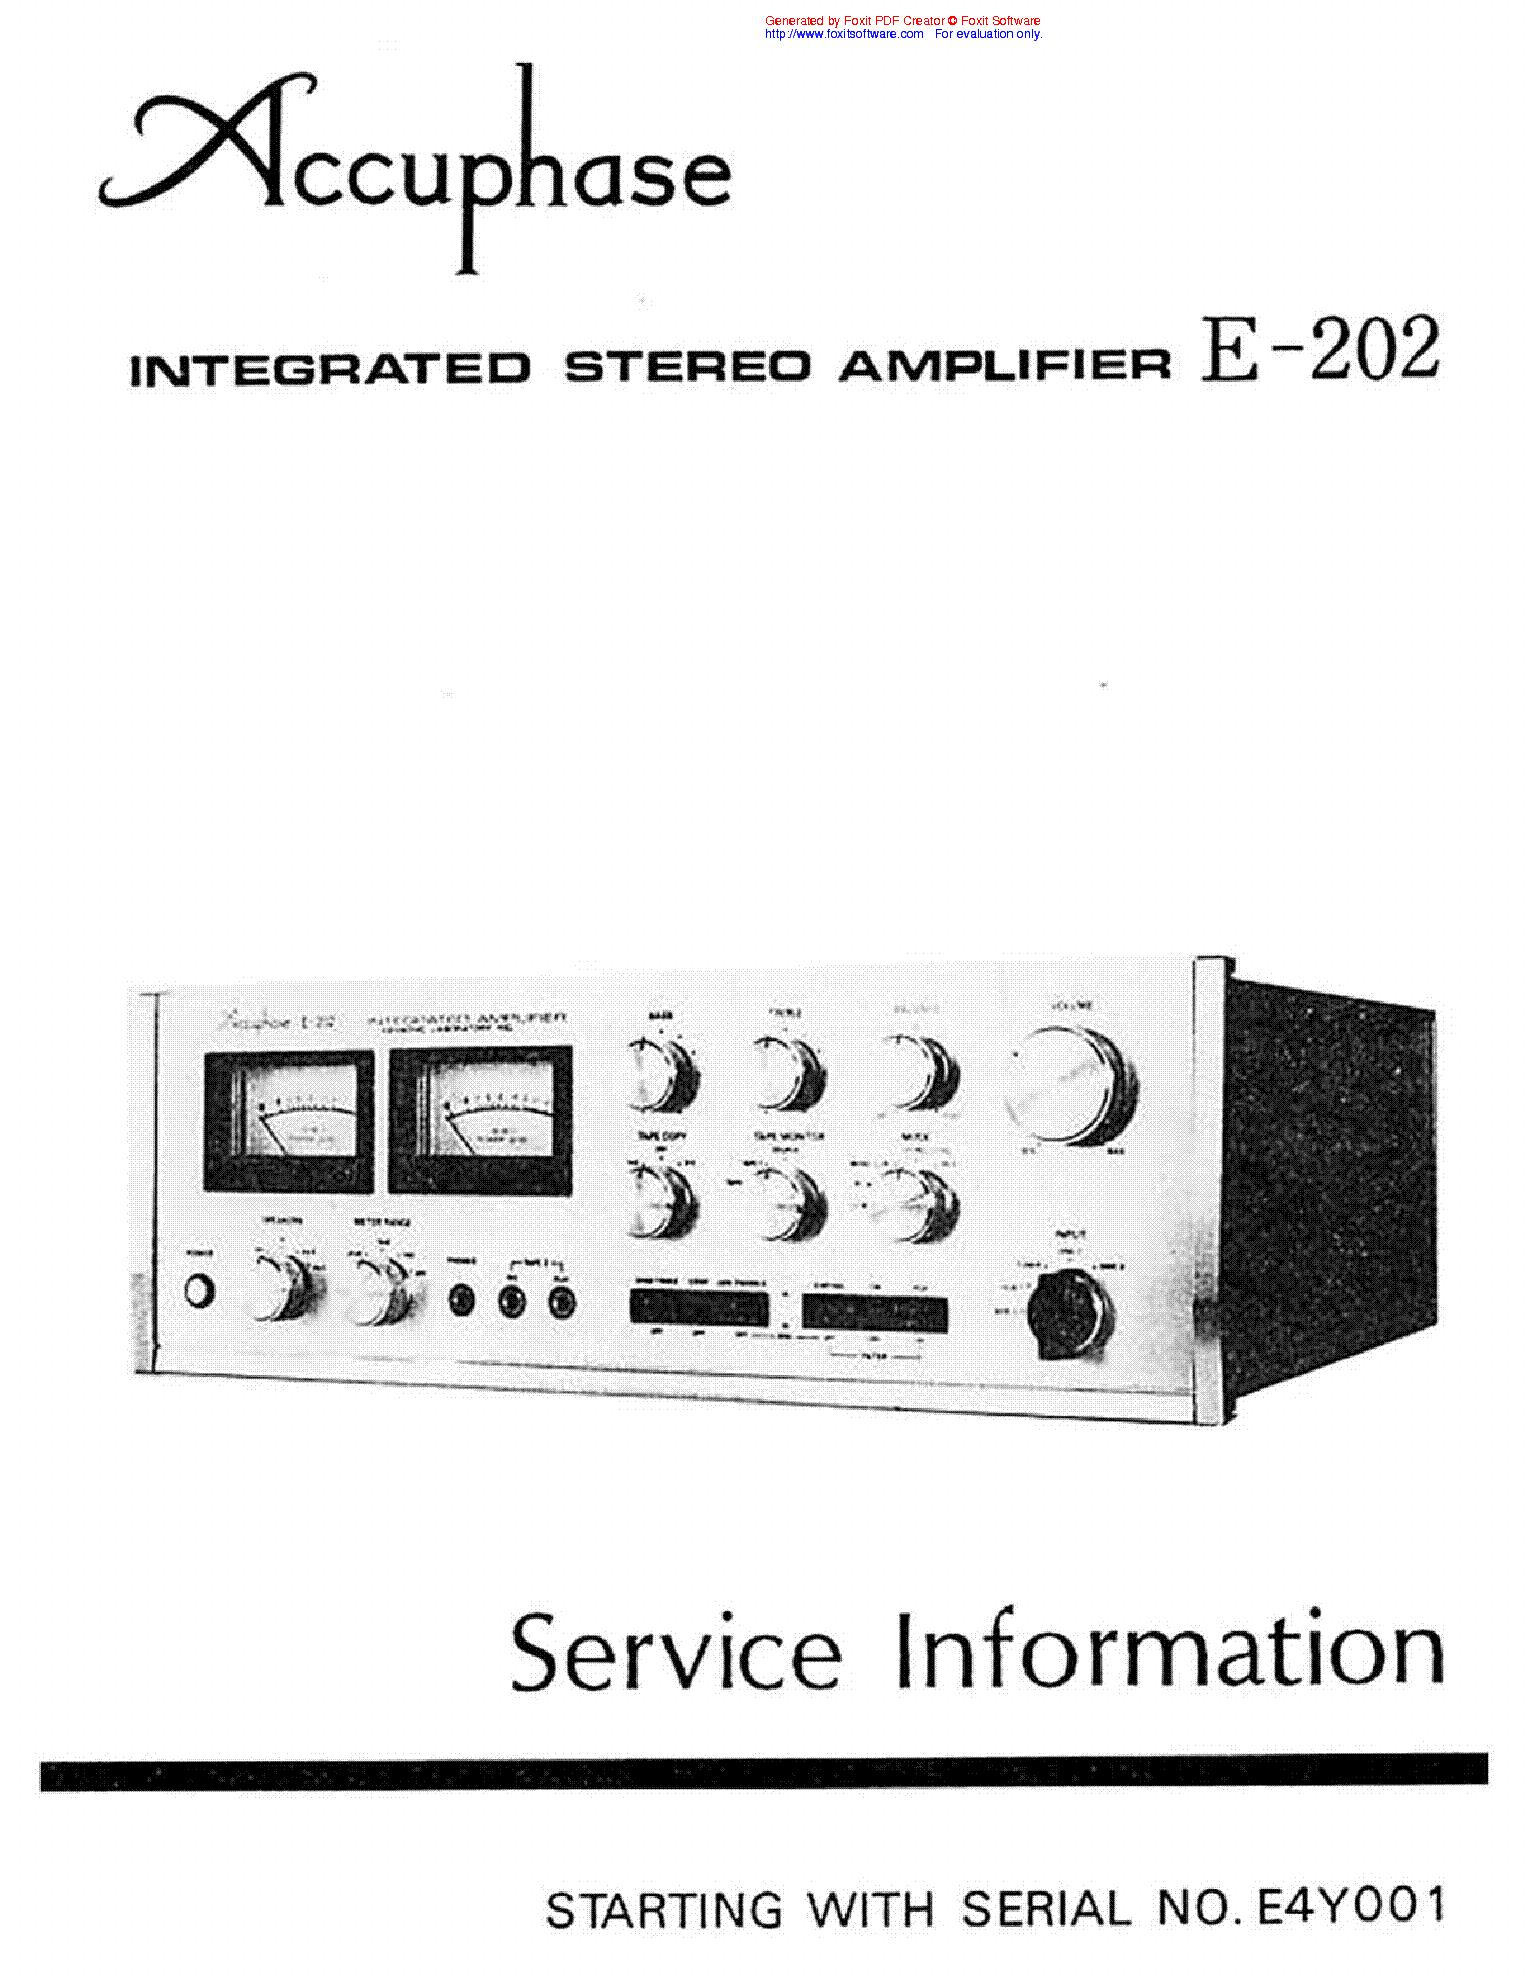 accuphase e 202 sm no sch service manual download schematics rh elektrotanya com accuphase e-470 user manual accuphase e-470 user manual